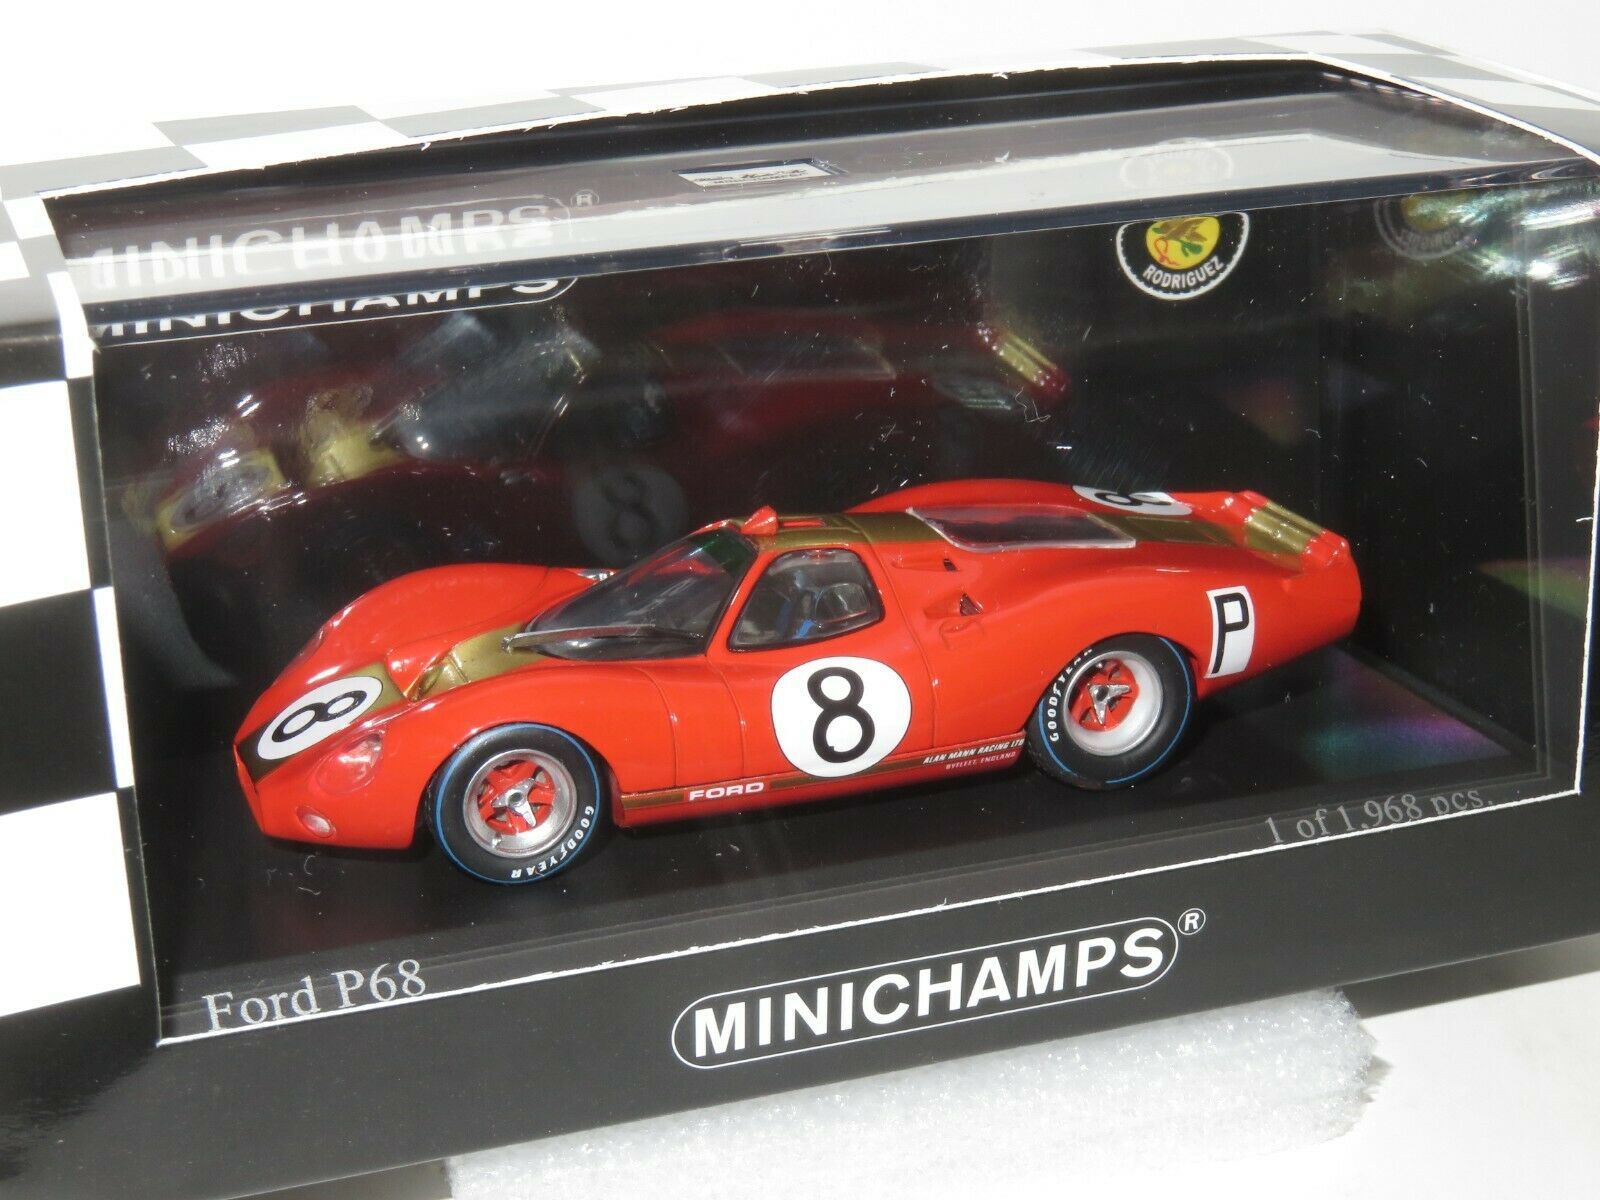 FORD P68 P68 P68 Alan Mann Racing nurburgring 1000km 1968  8 Irwin Rodriguez e425ae